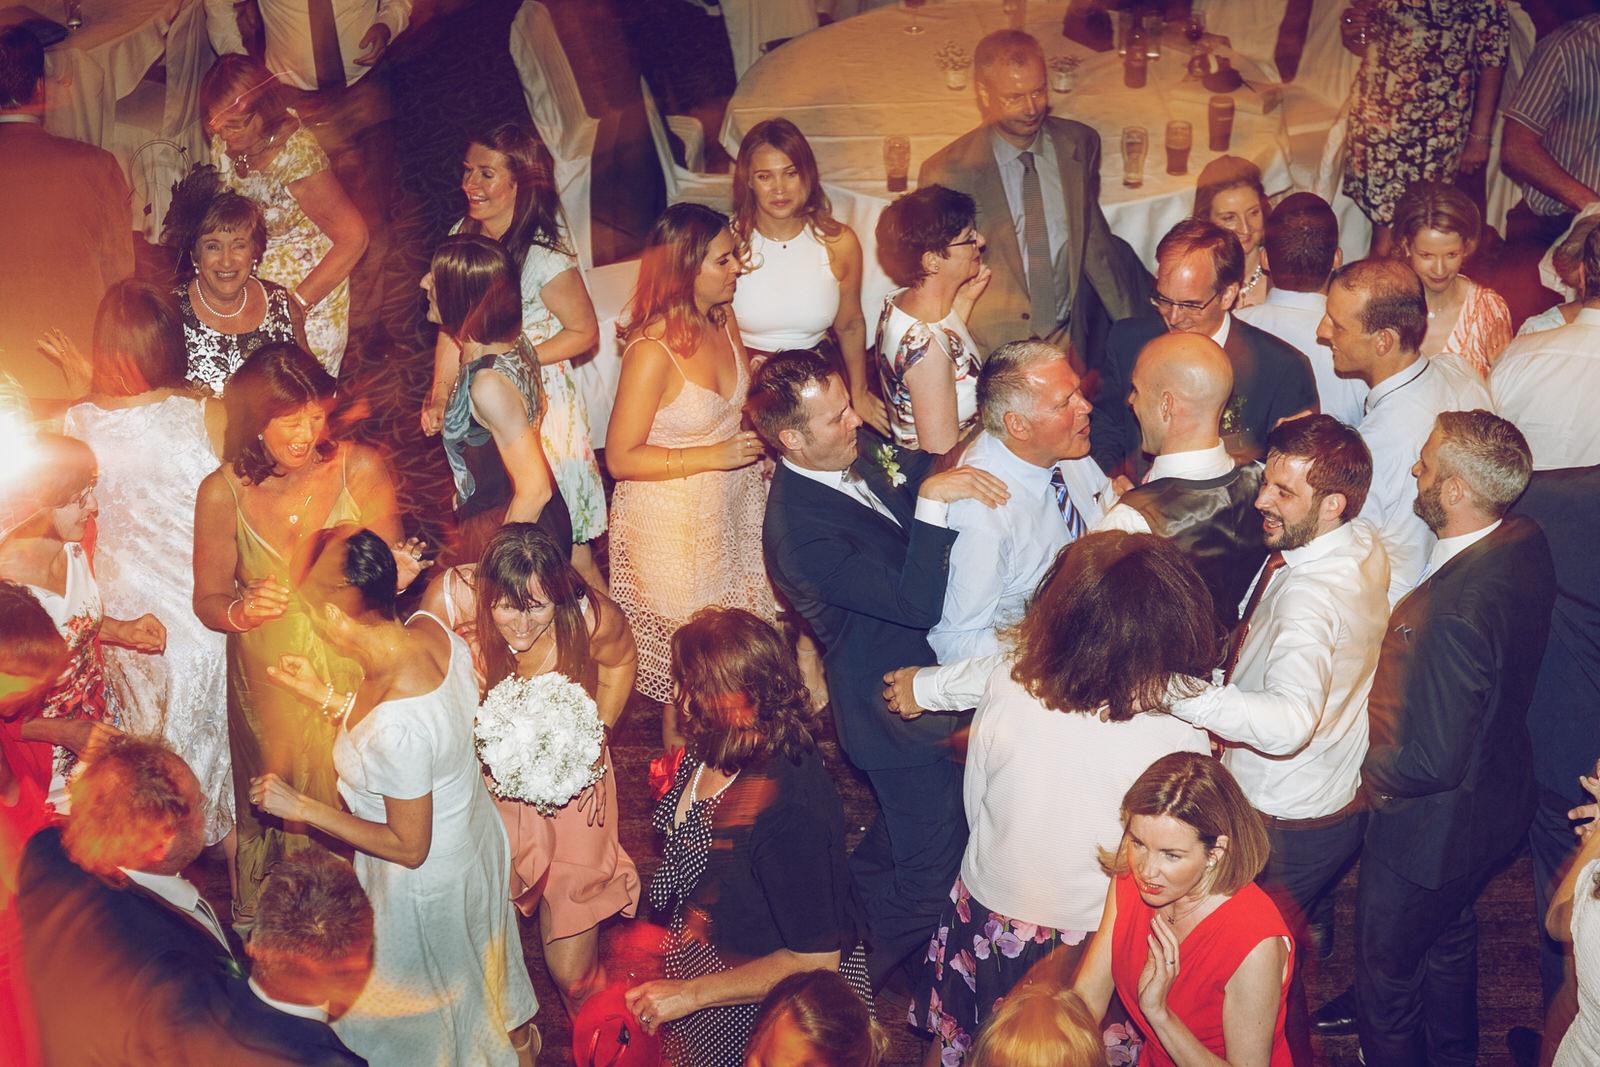 Brooklodge-wicklow-wedding-photographer_155.jpg